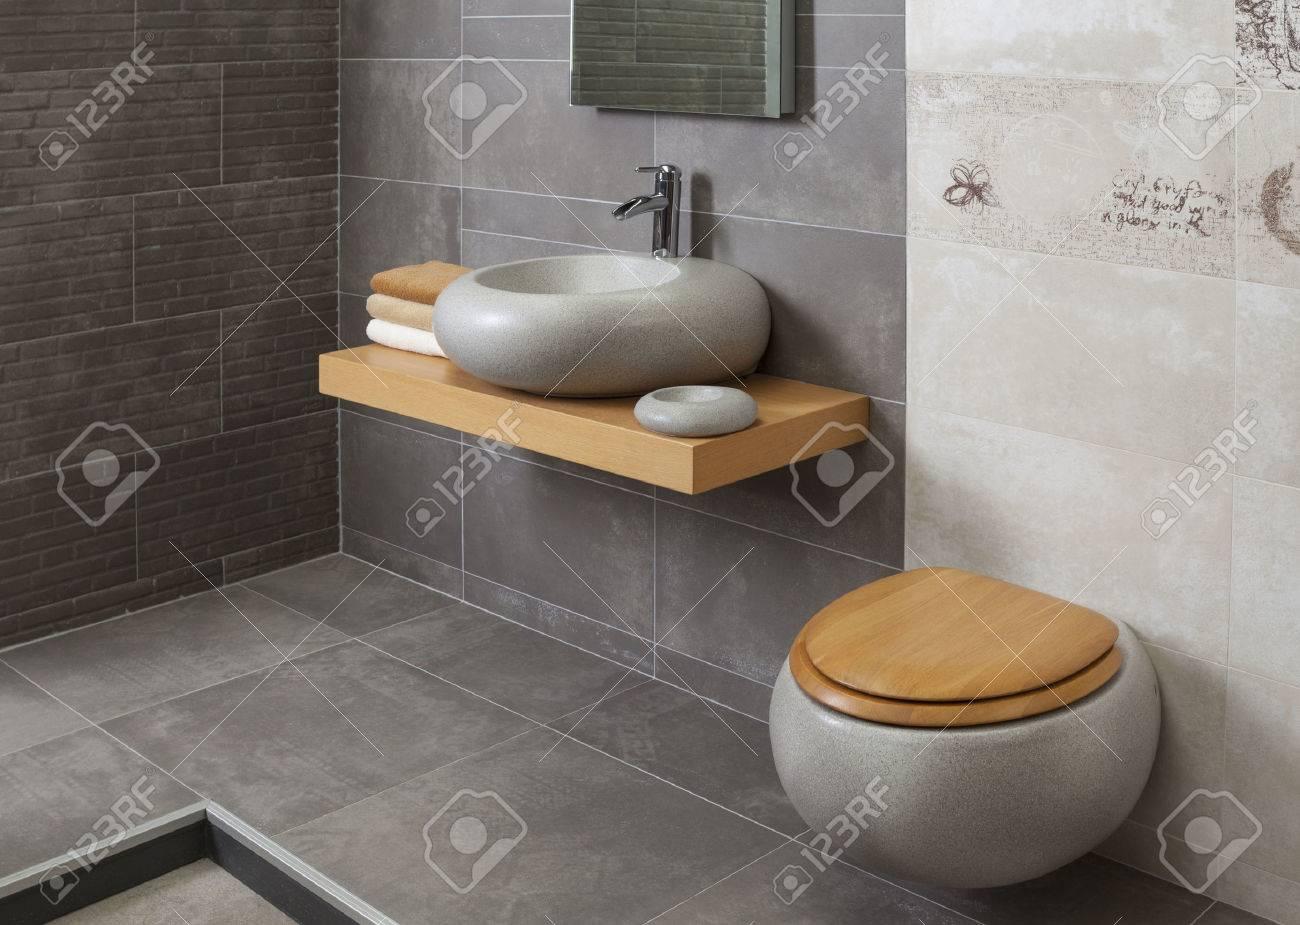 Küvet Ve Lavabo Ile Modern Bir Banyo Detay Royalty Free Stok ...